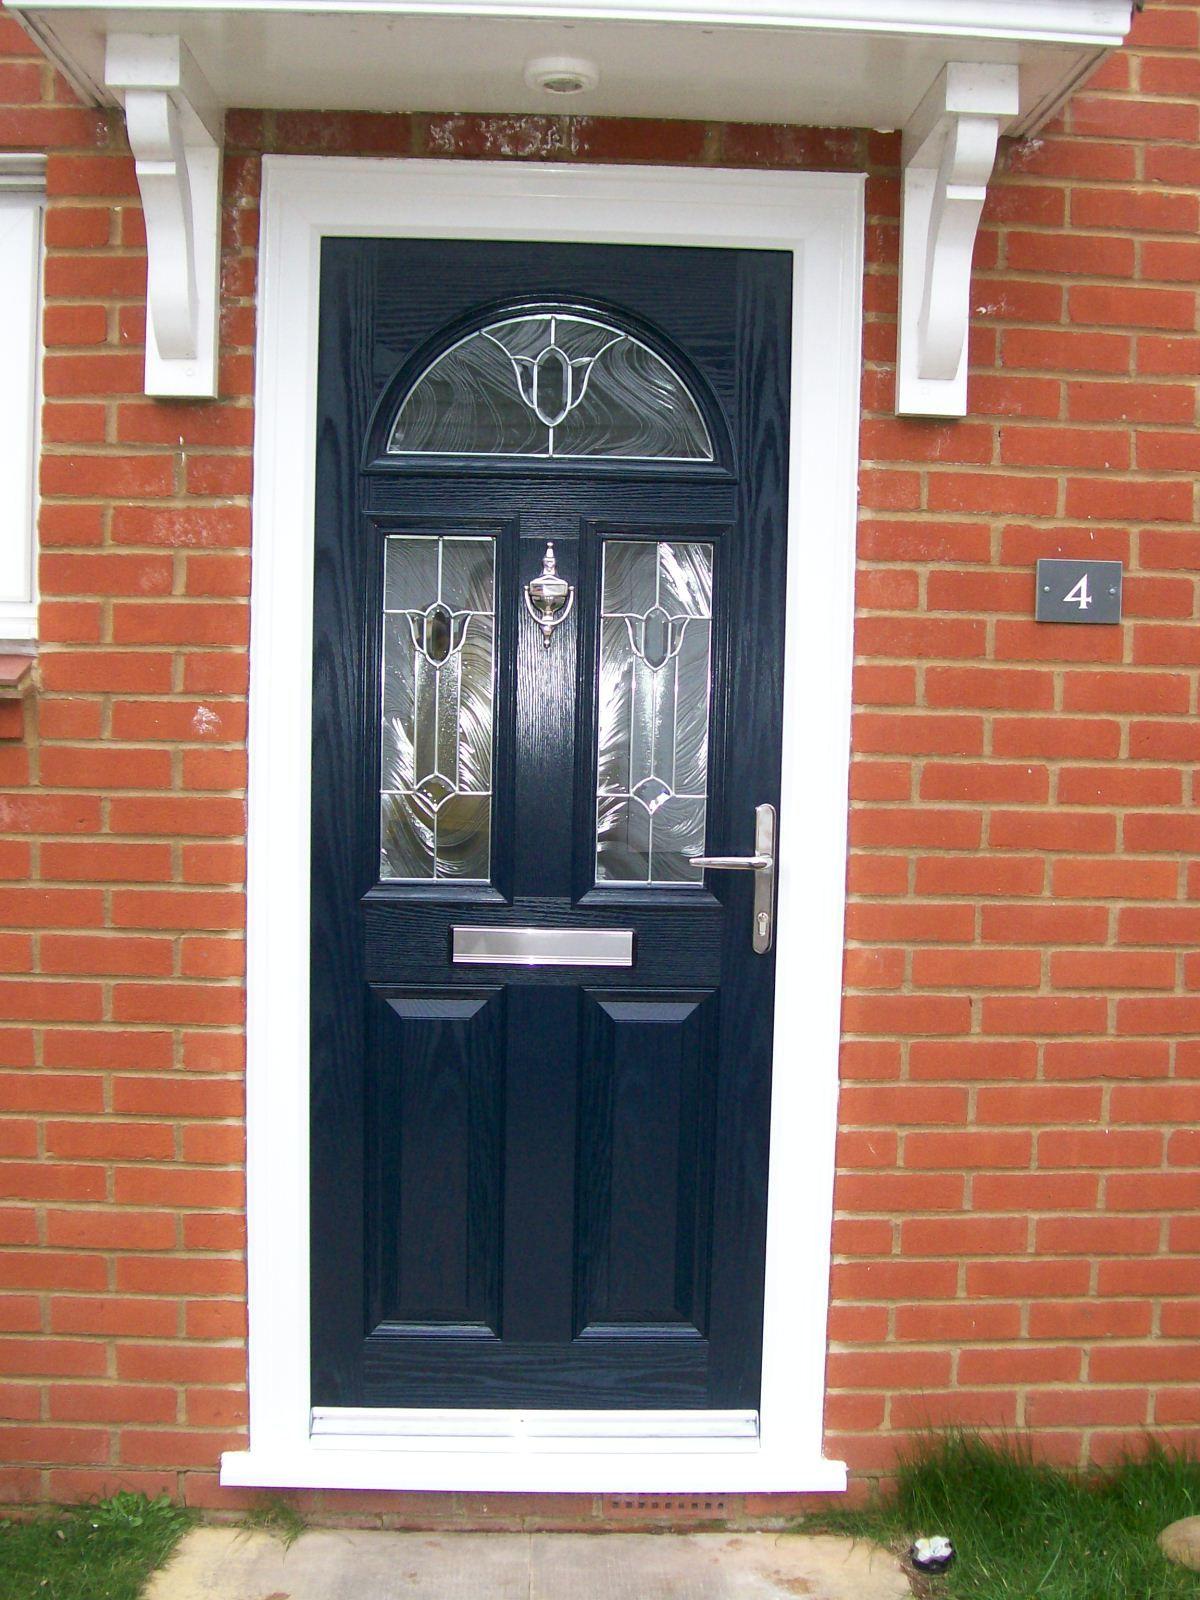 Blue Composite Door secured by design high security door & Blue Composite Door secured by design high security door ... Pezcame.Com